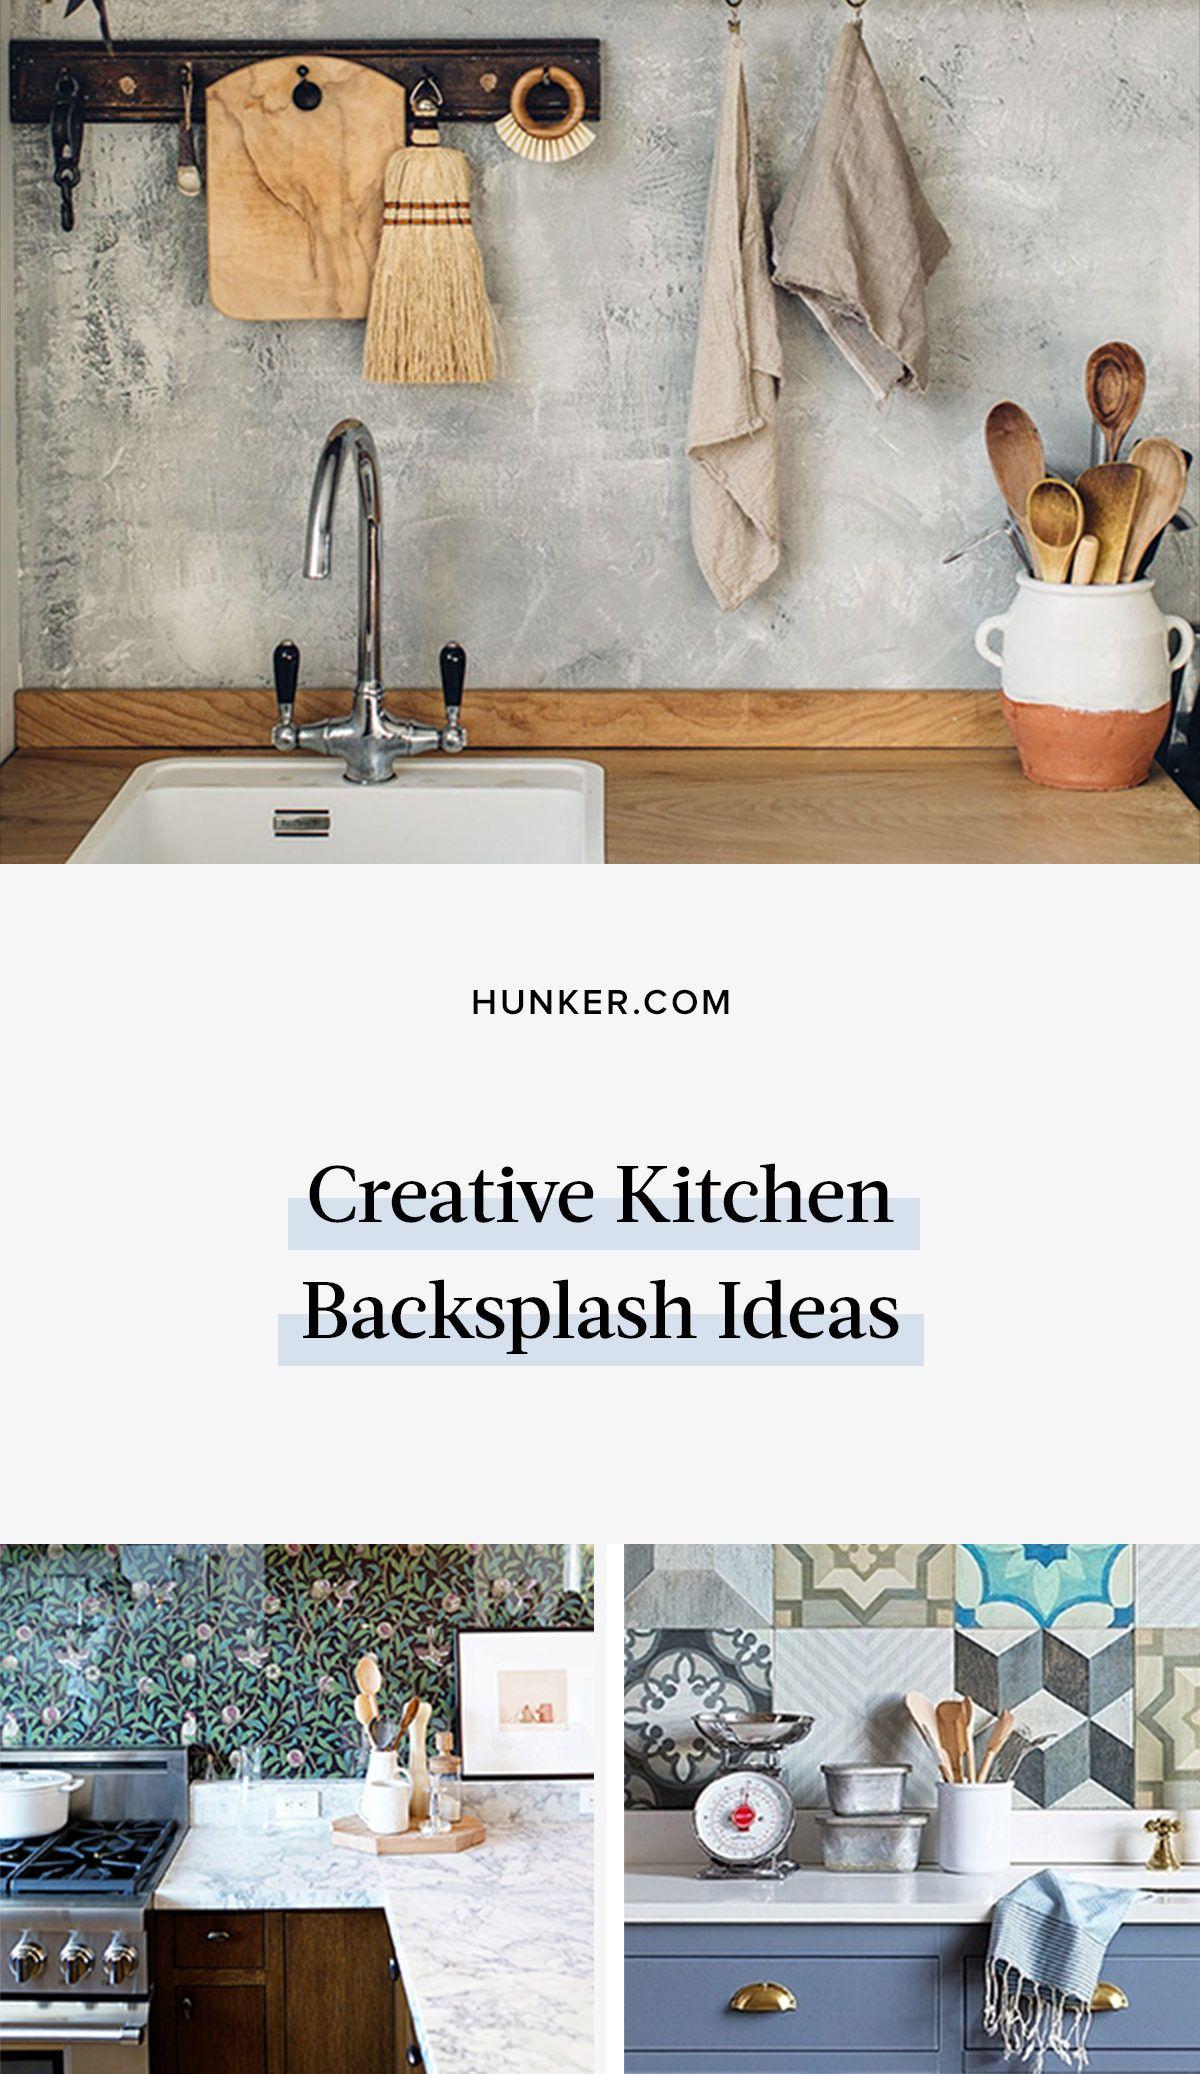 9 Creative Kitchen Backsplash Ideas Bursting With Originality Hunker Creative Kitchen Backsplash Kitchen Backsplash Contemporary Kitchen